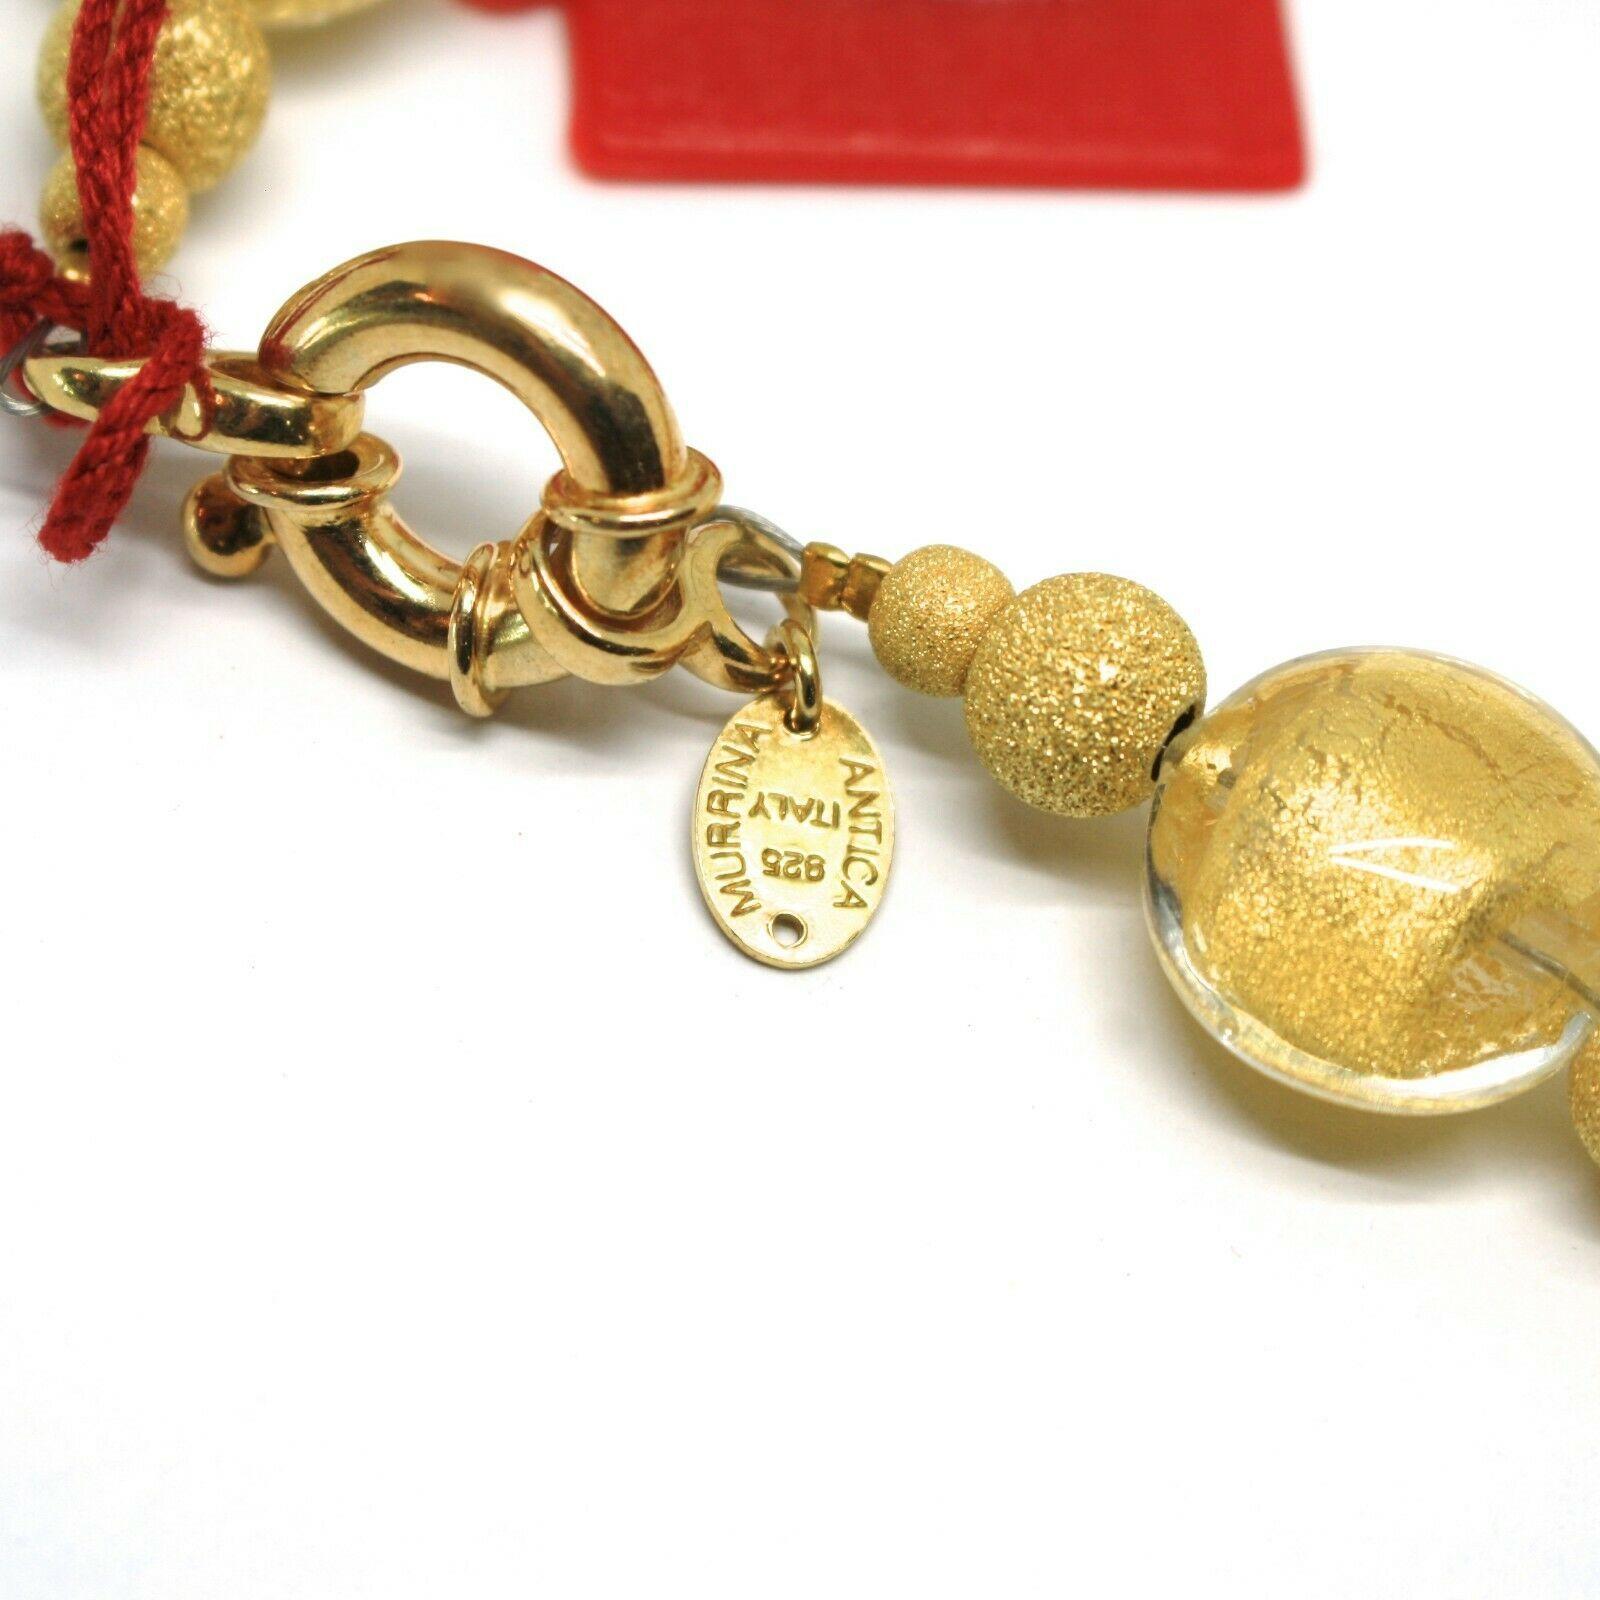 Halskette Antica Murrina Venezia, Glas Murano, 925 Silber, Blatt Gold, CO015A09